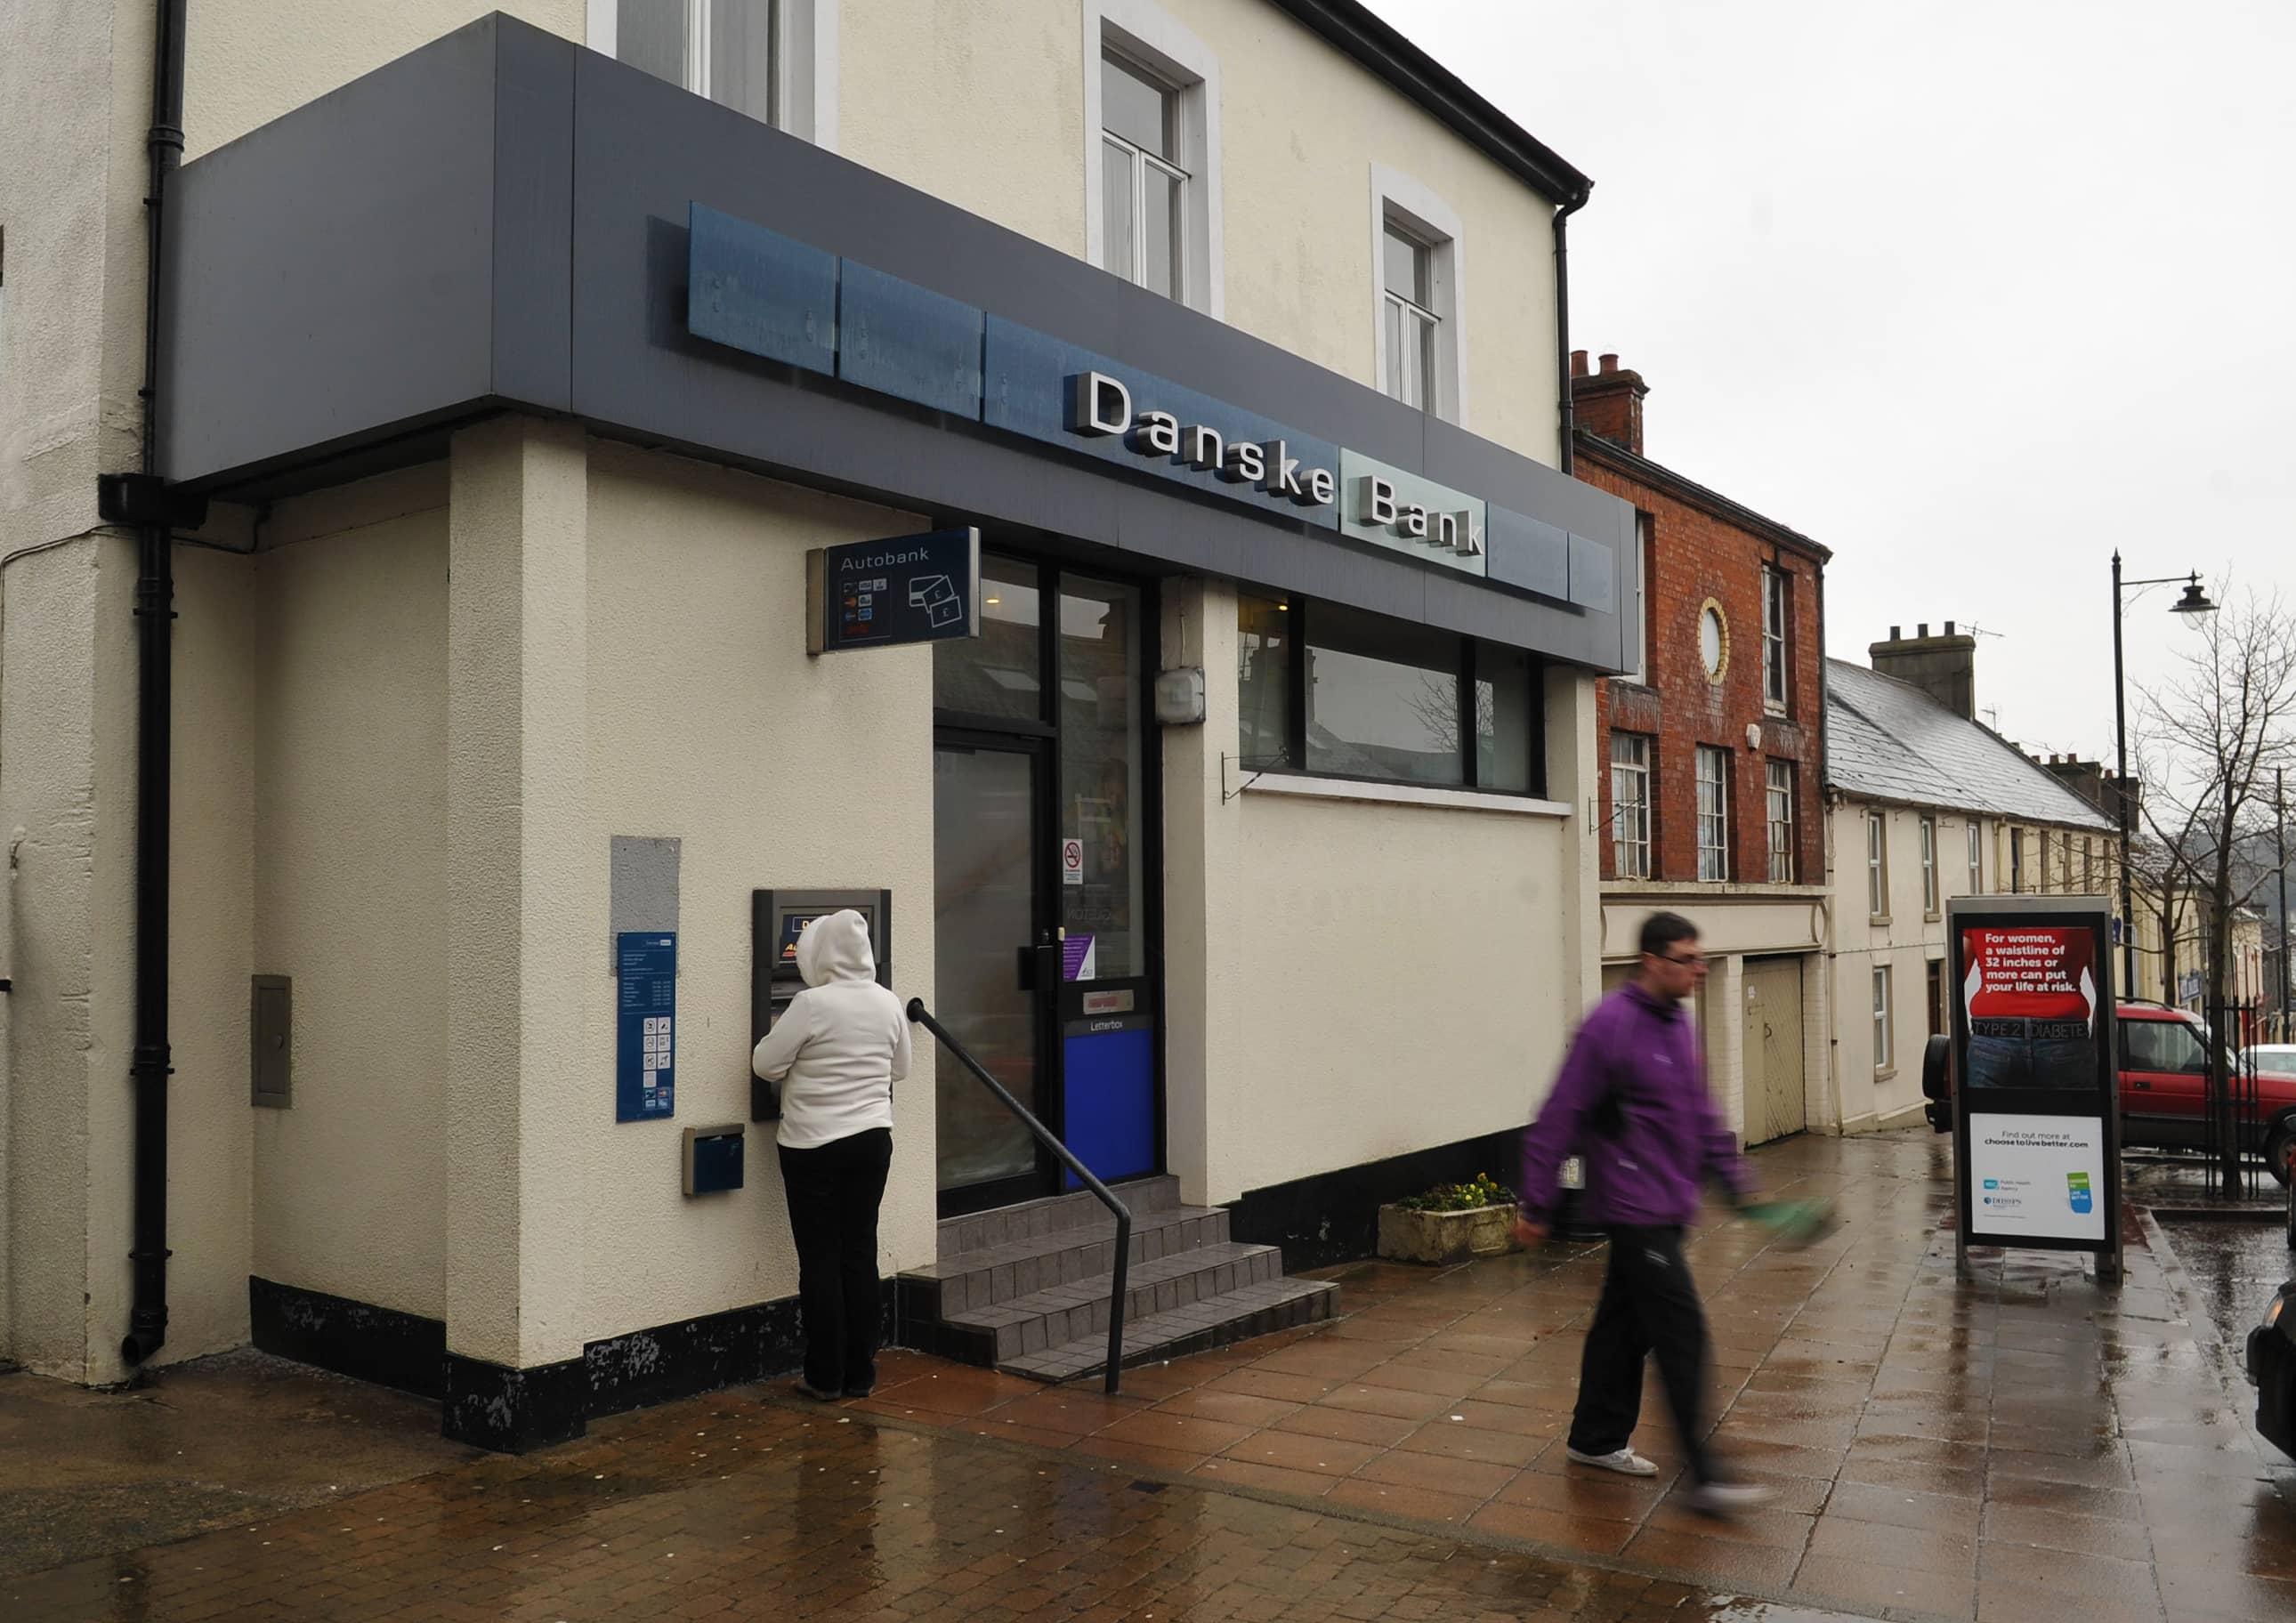 Damske Bank